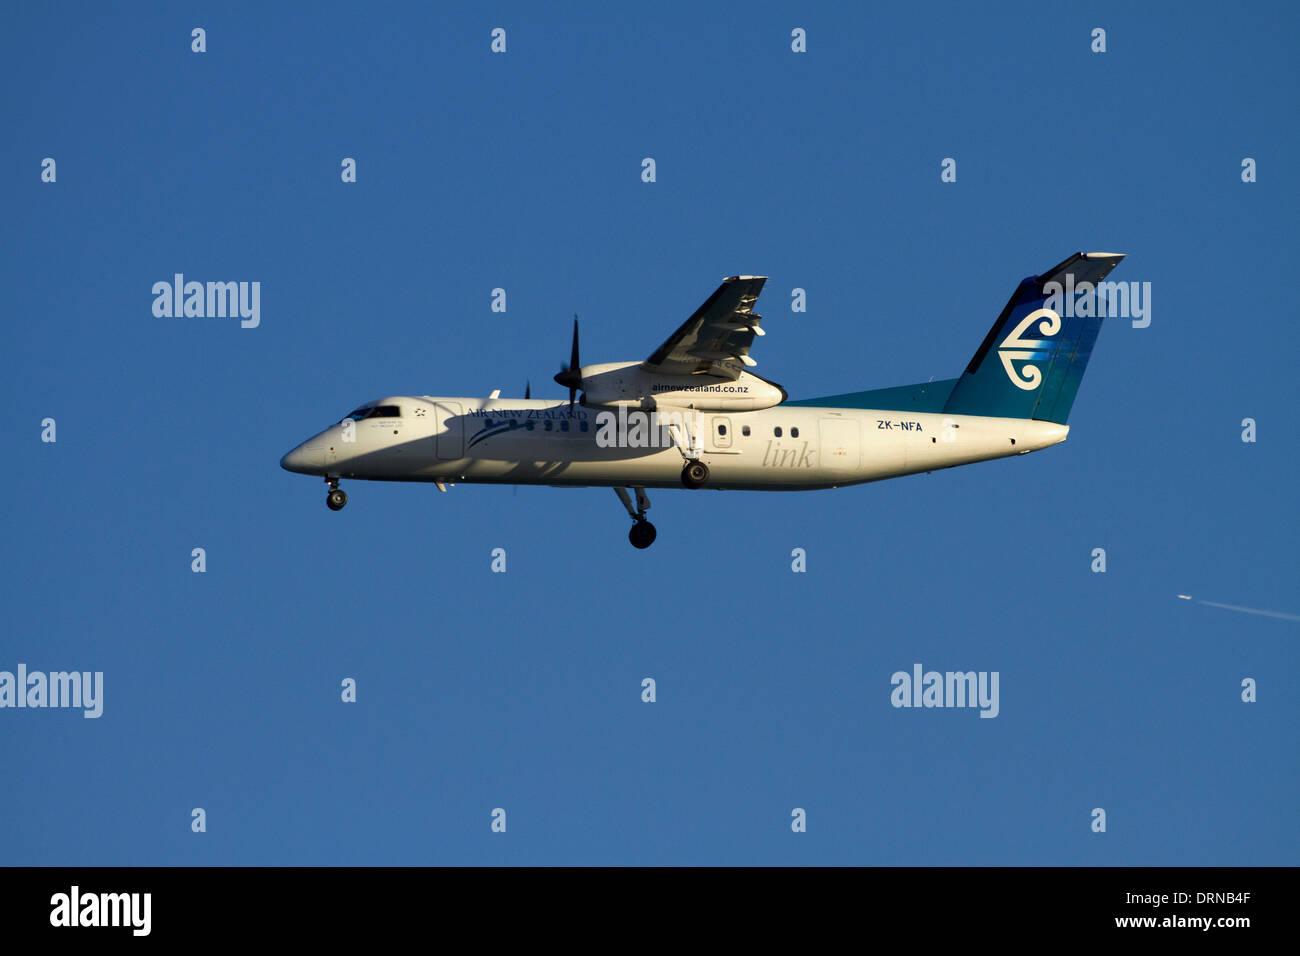 Air New Zealand Dash 8 aircraft - Stock Image